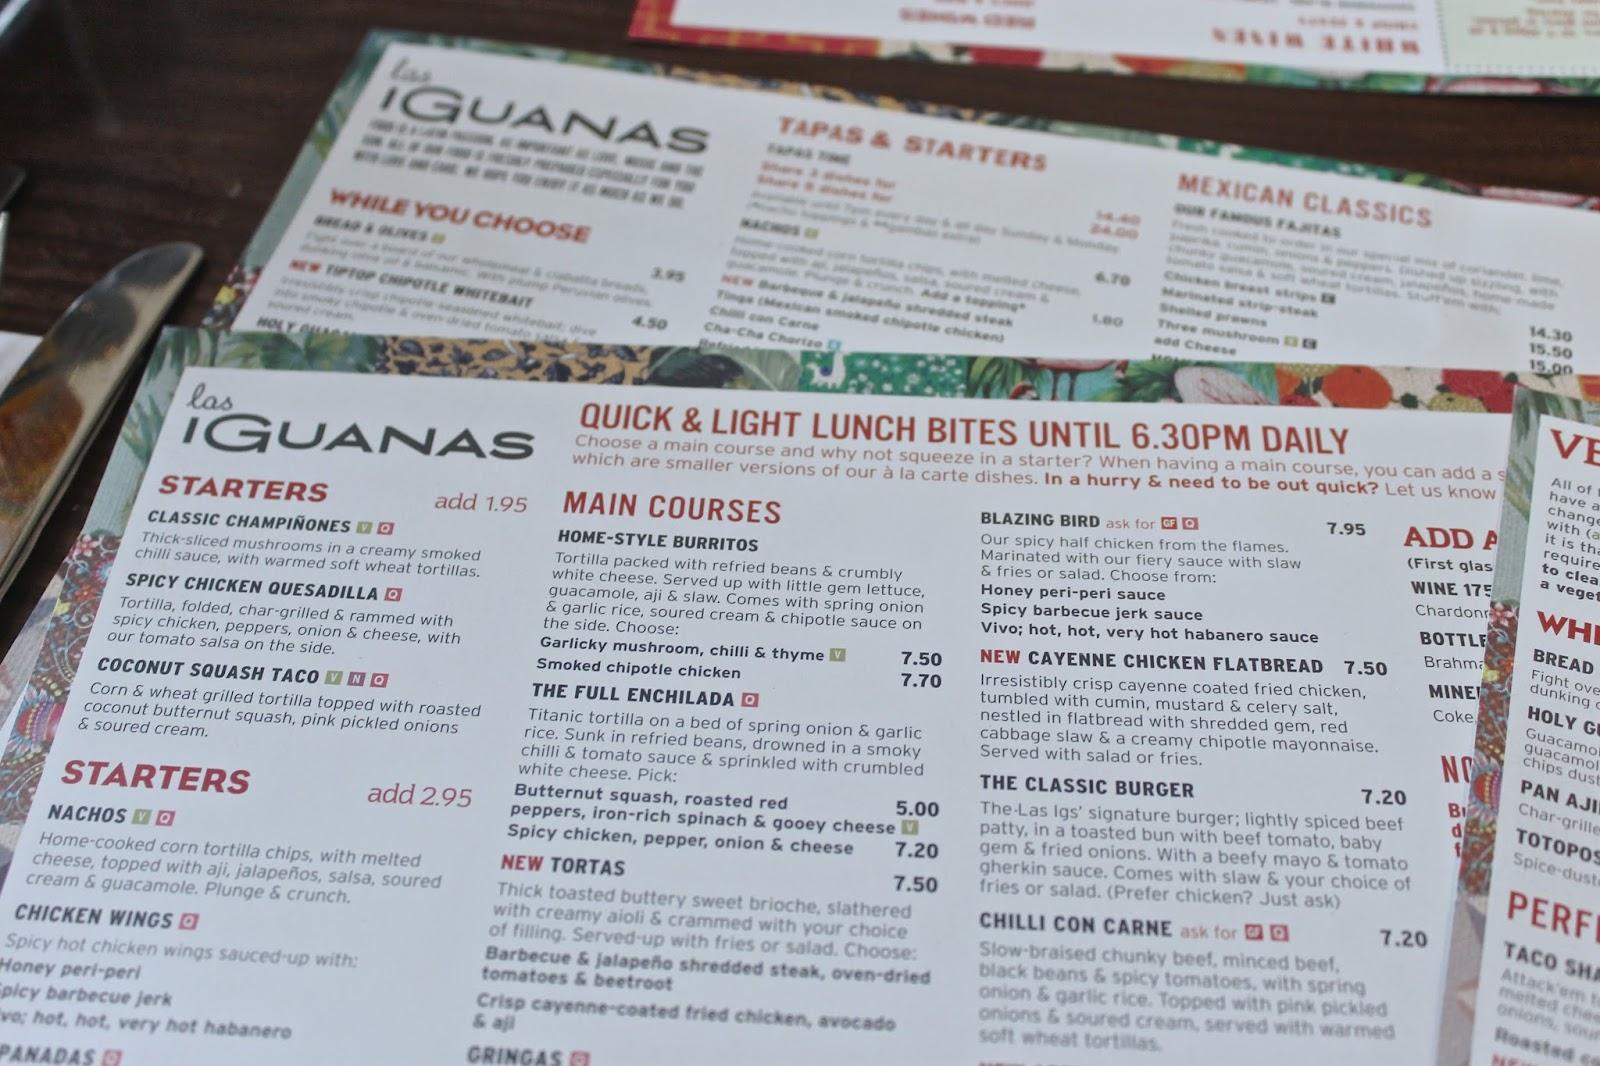 Las Iguanas Restaurant Review - Bump to Baby & Beyond Blog - UK ...